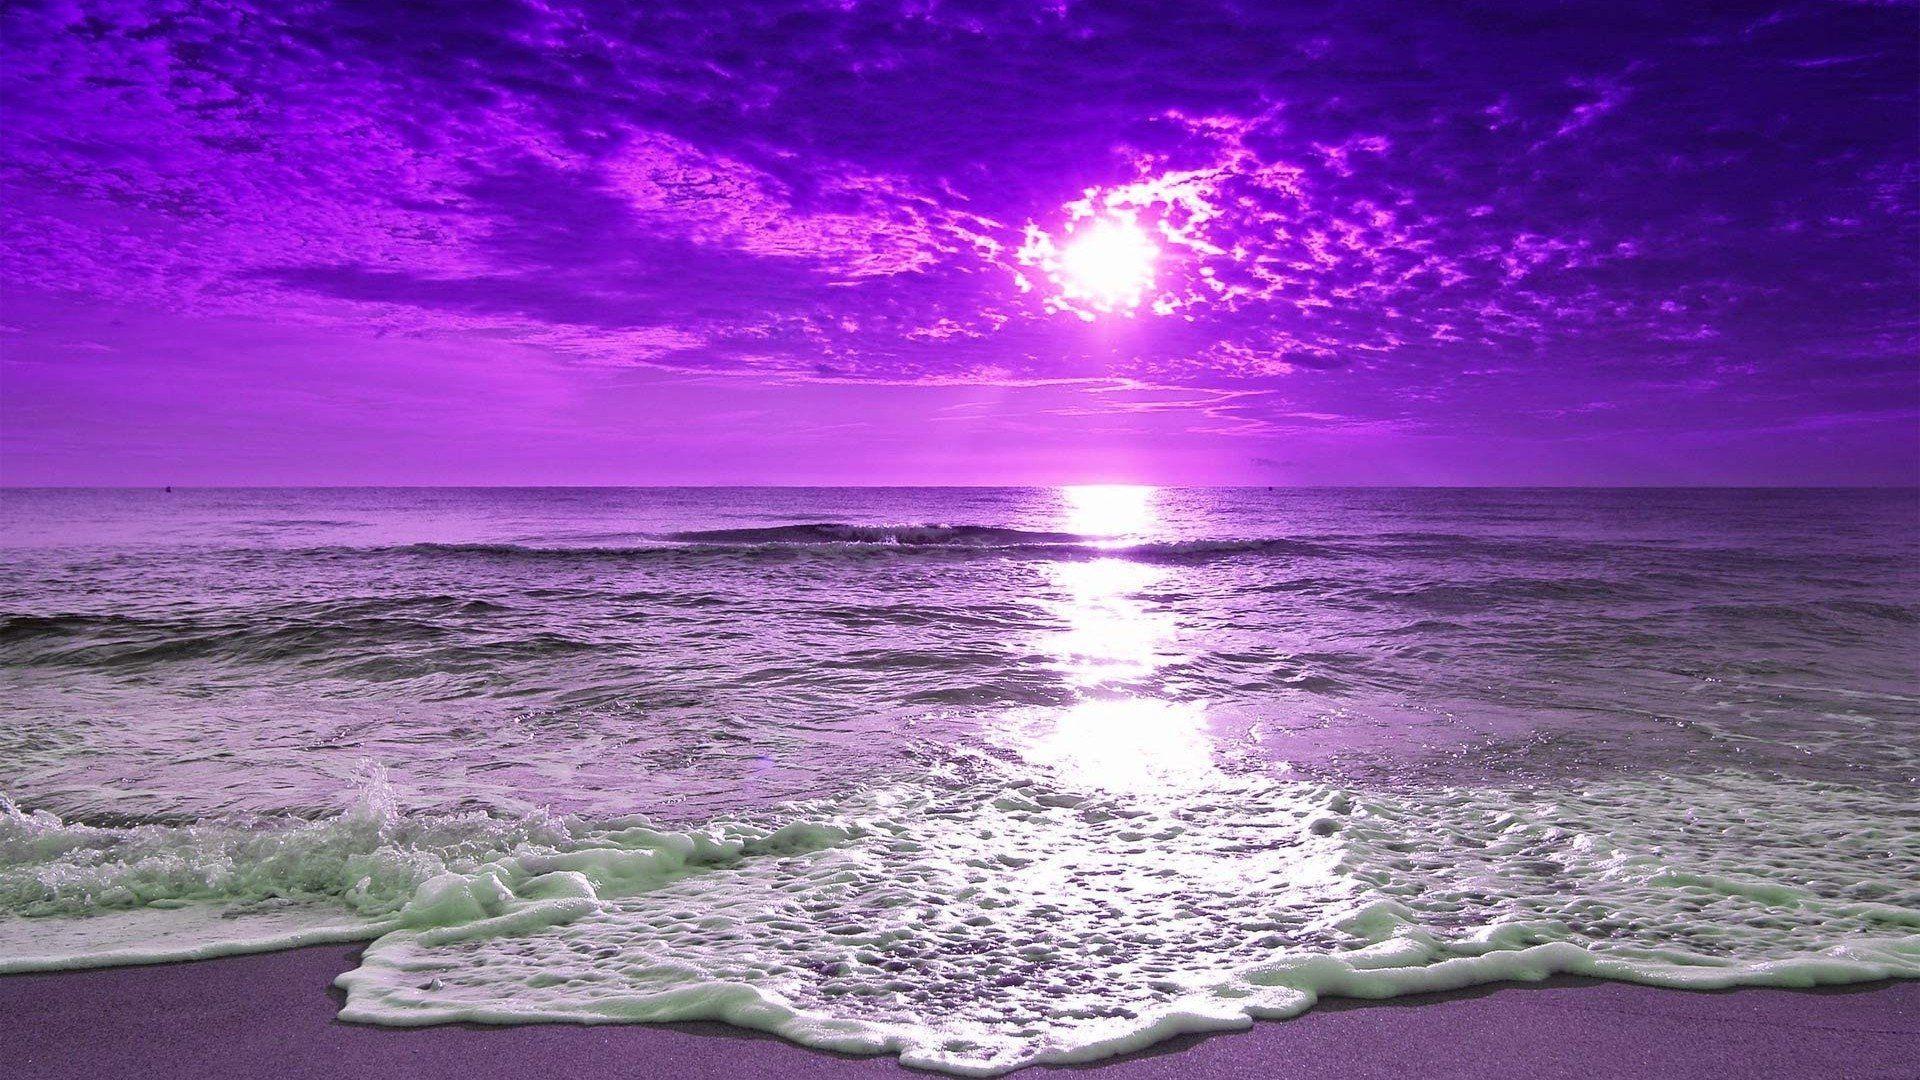 Purple Beach Wallpapers Top Free Purple Beach Backgrounds Wallpaperaccess